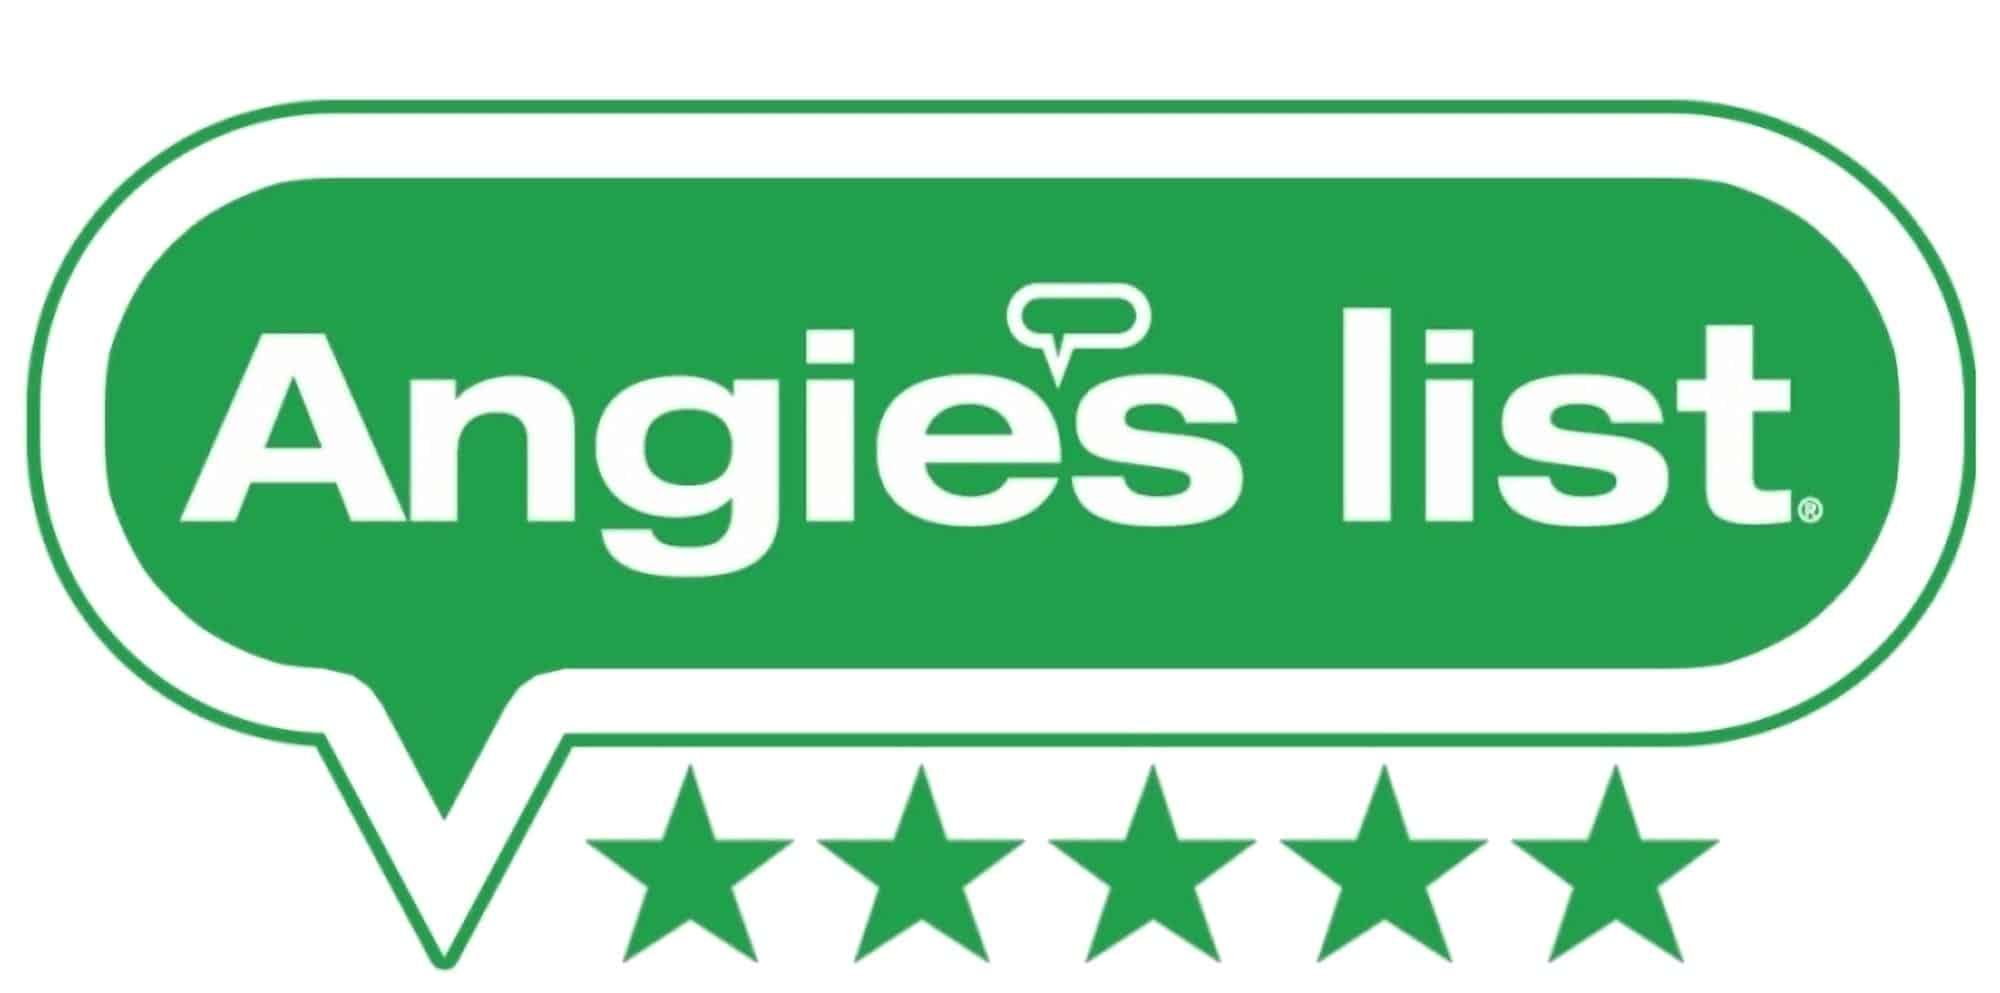 Angie's List 5 star logo